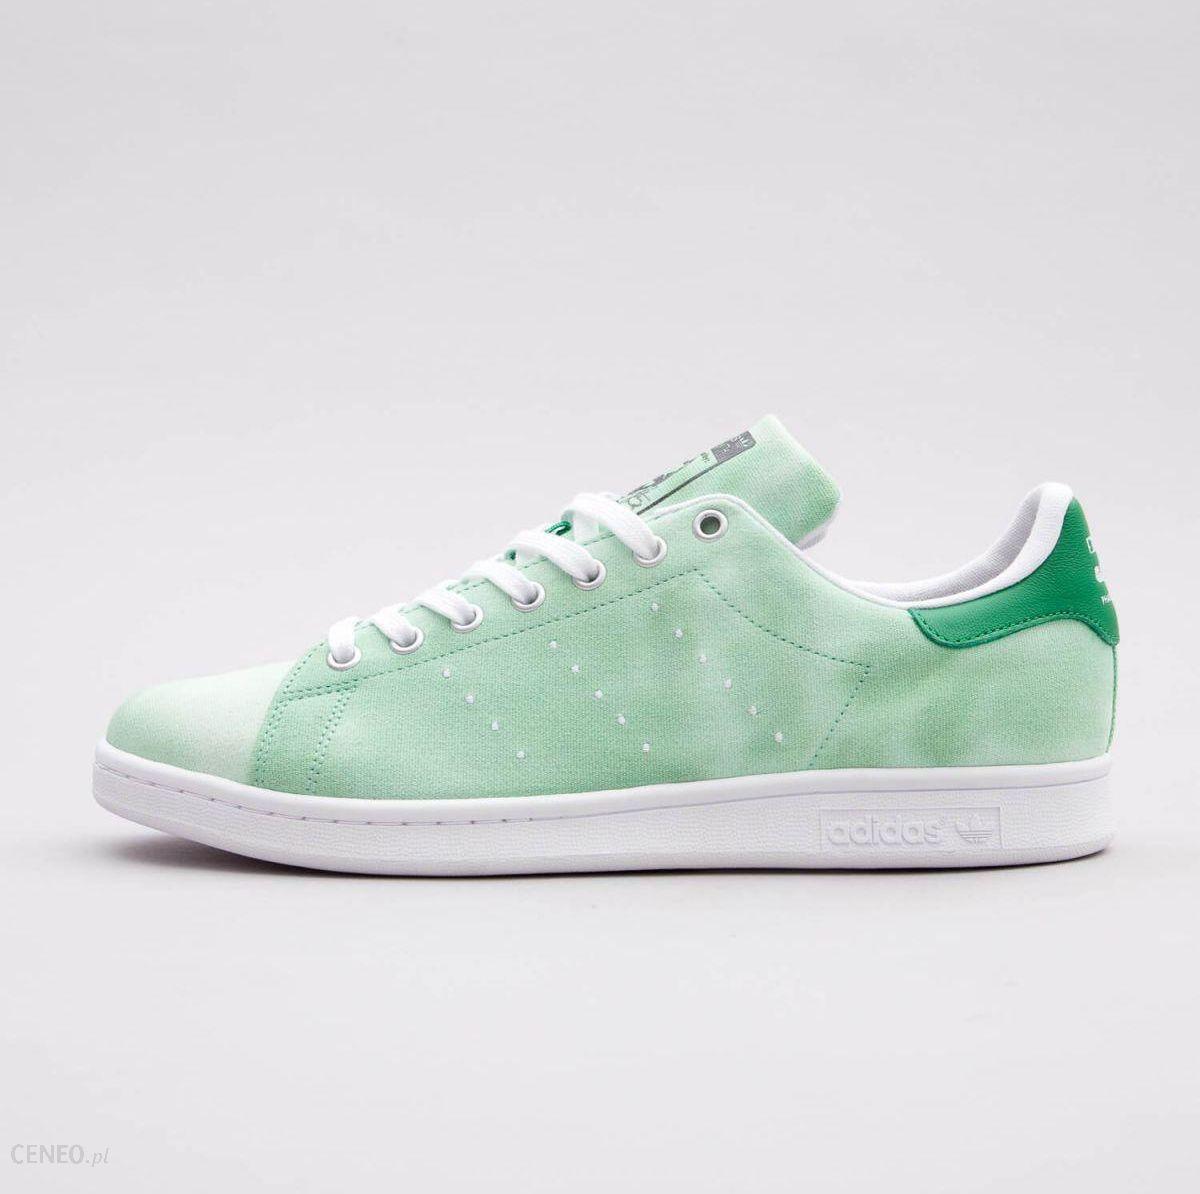 Buty adidas Pharrell Williams Hu Holi Stan Smith (AC7043)